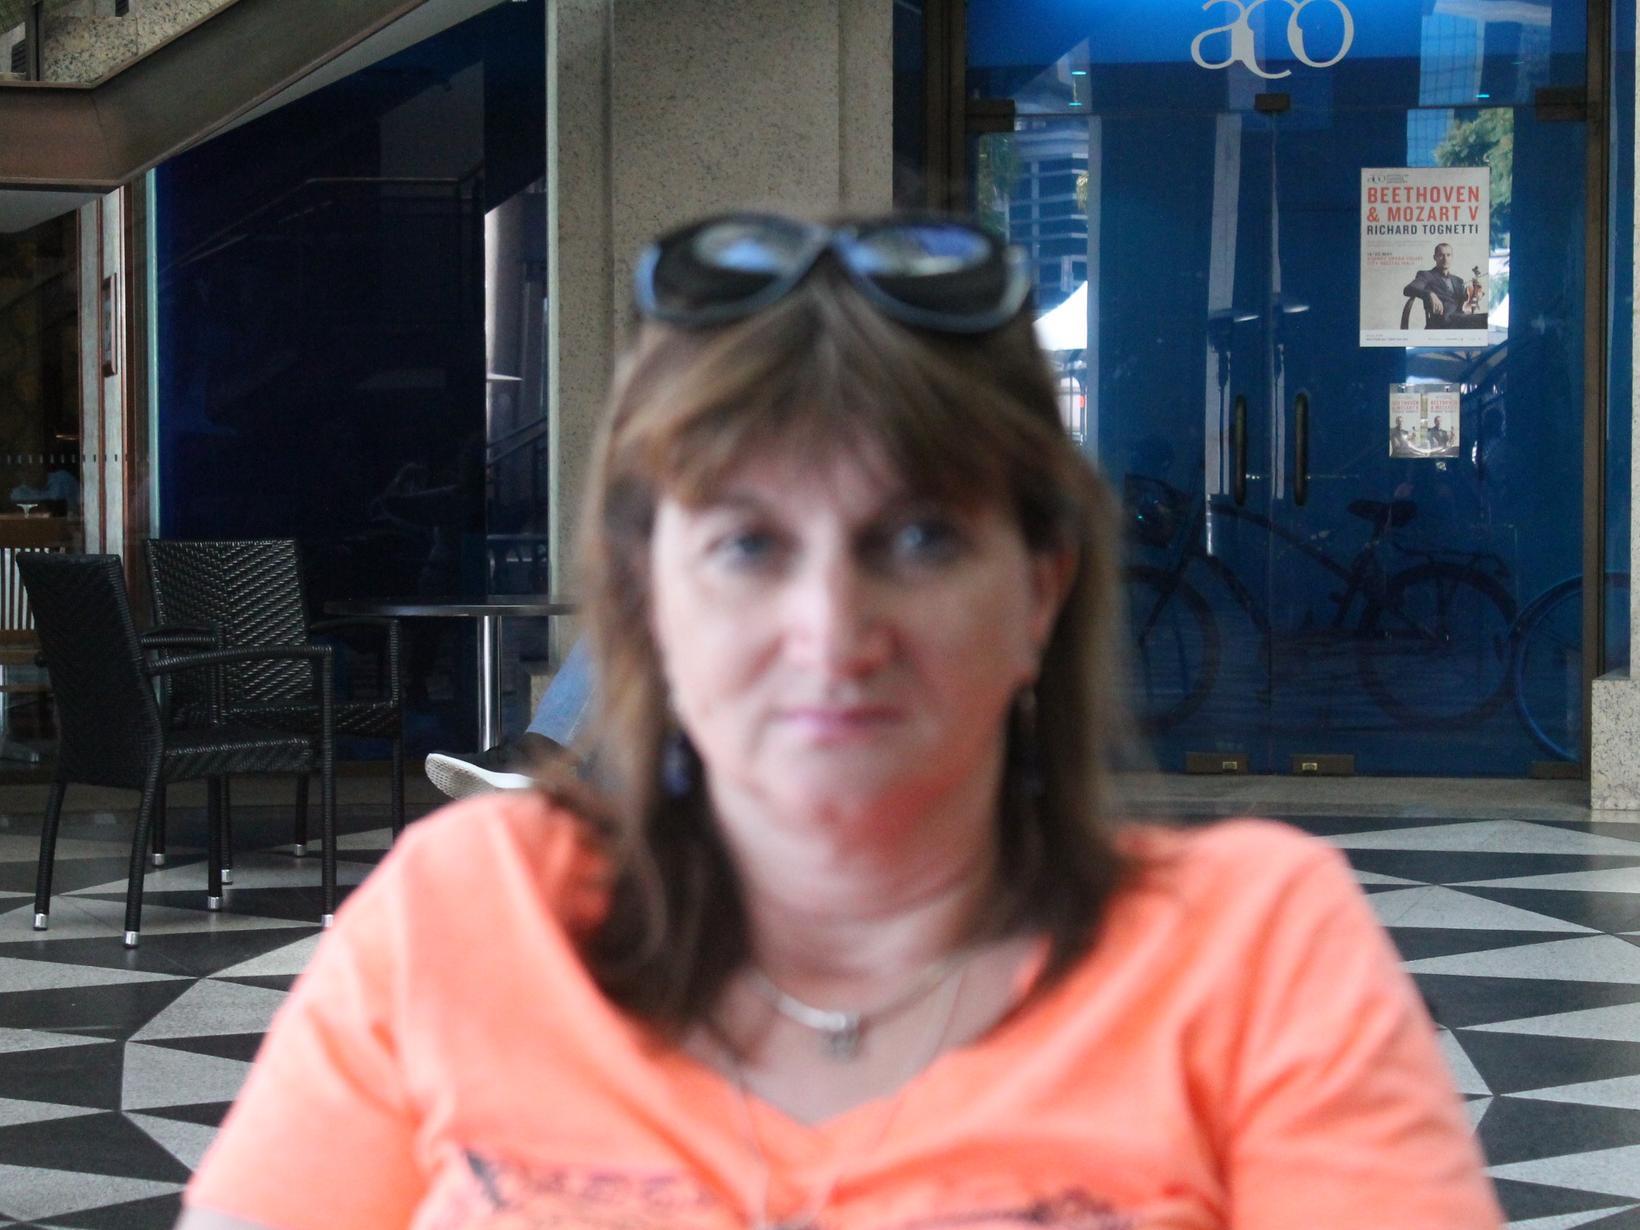 Ruth from South Perth, Western Australia, Australia